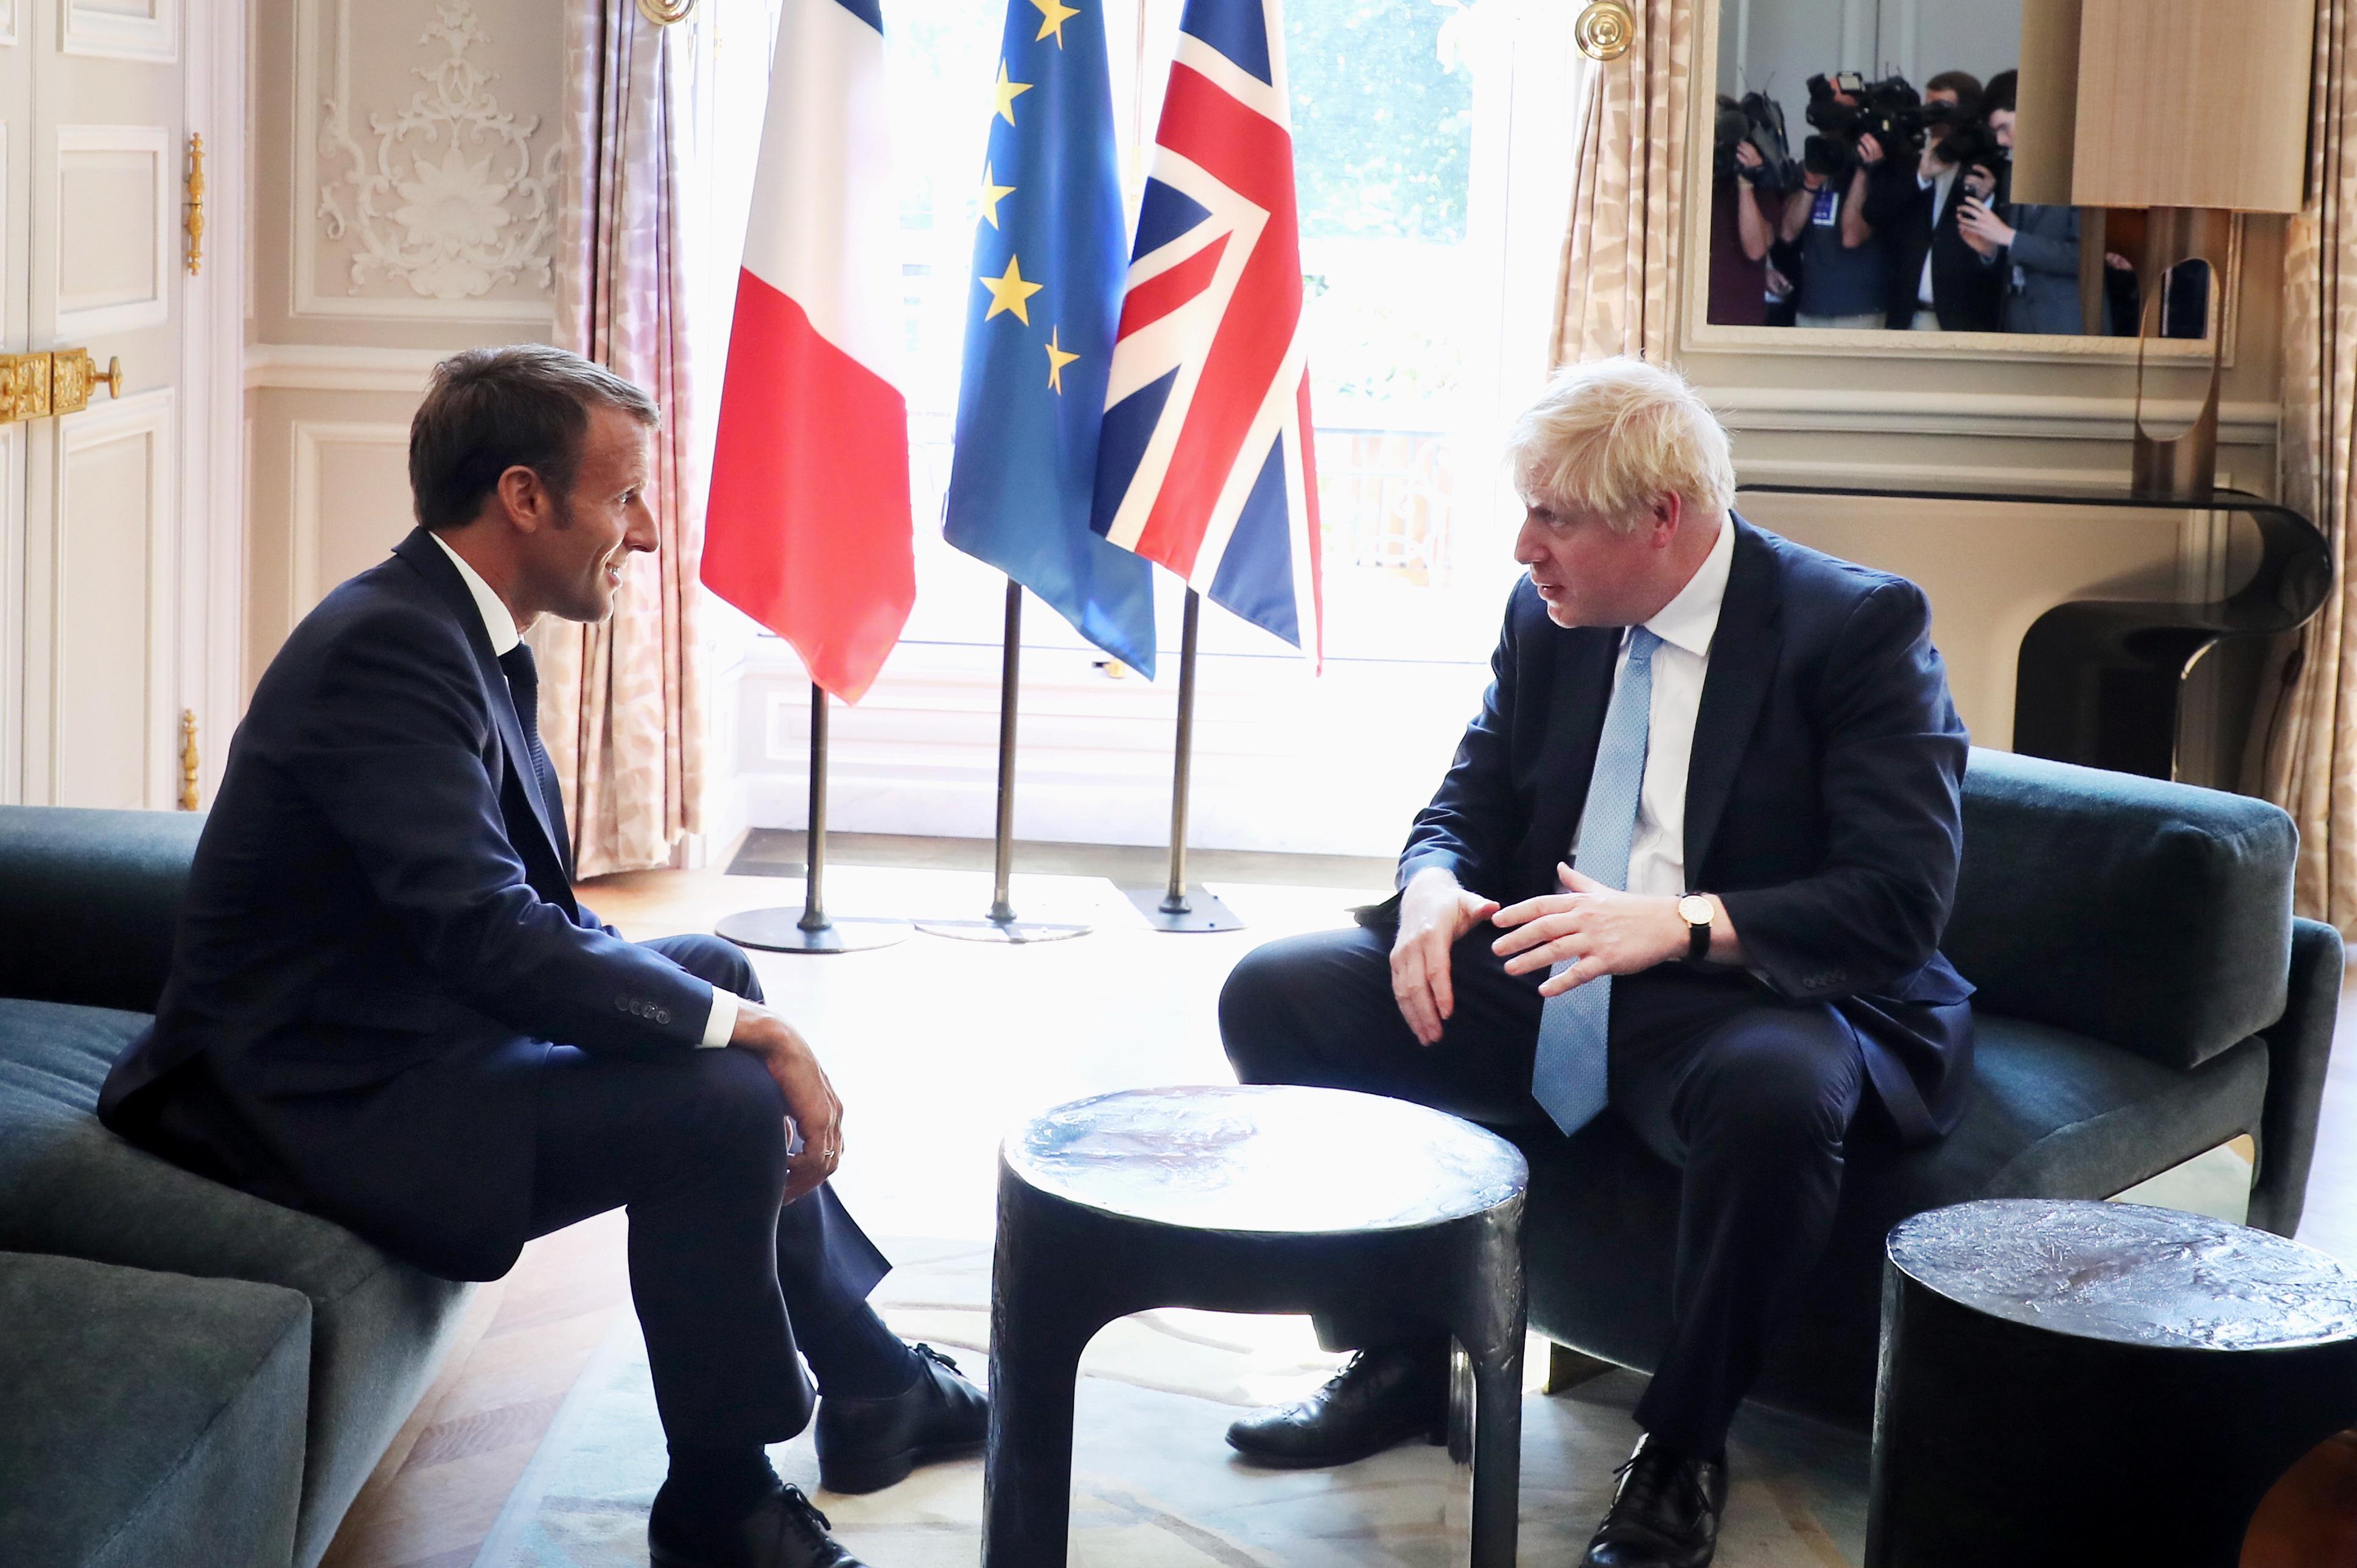 Britain-EU talks must respect single market integrity, Irish stability - Macron